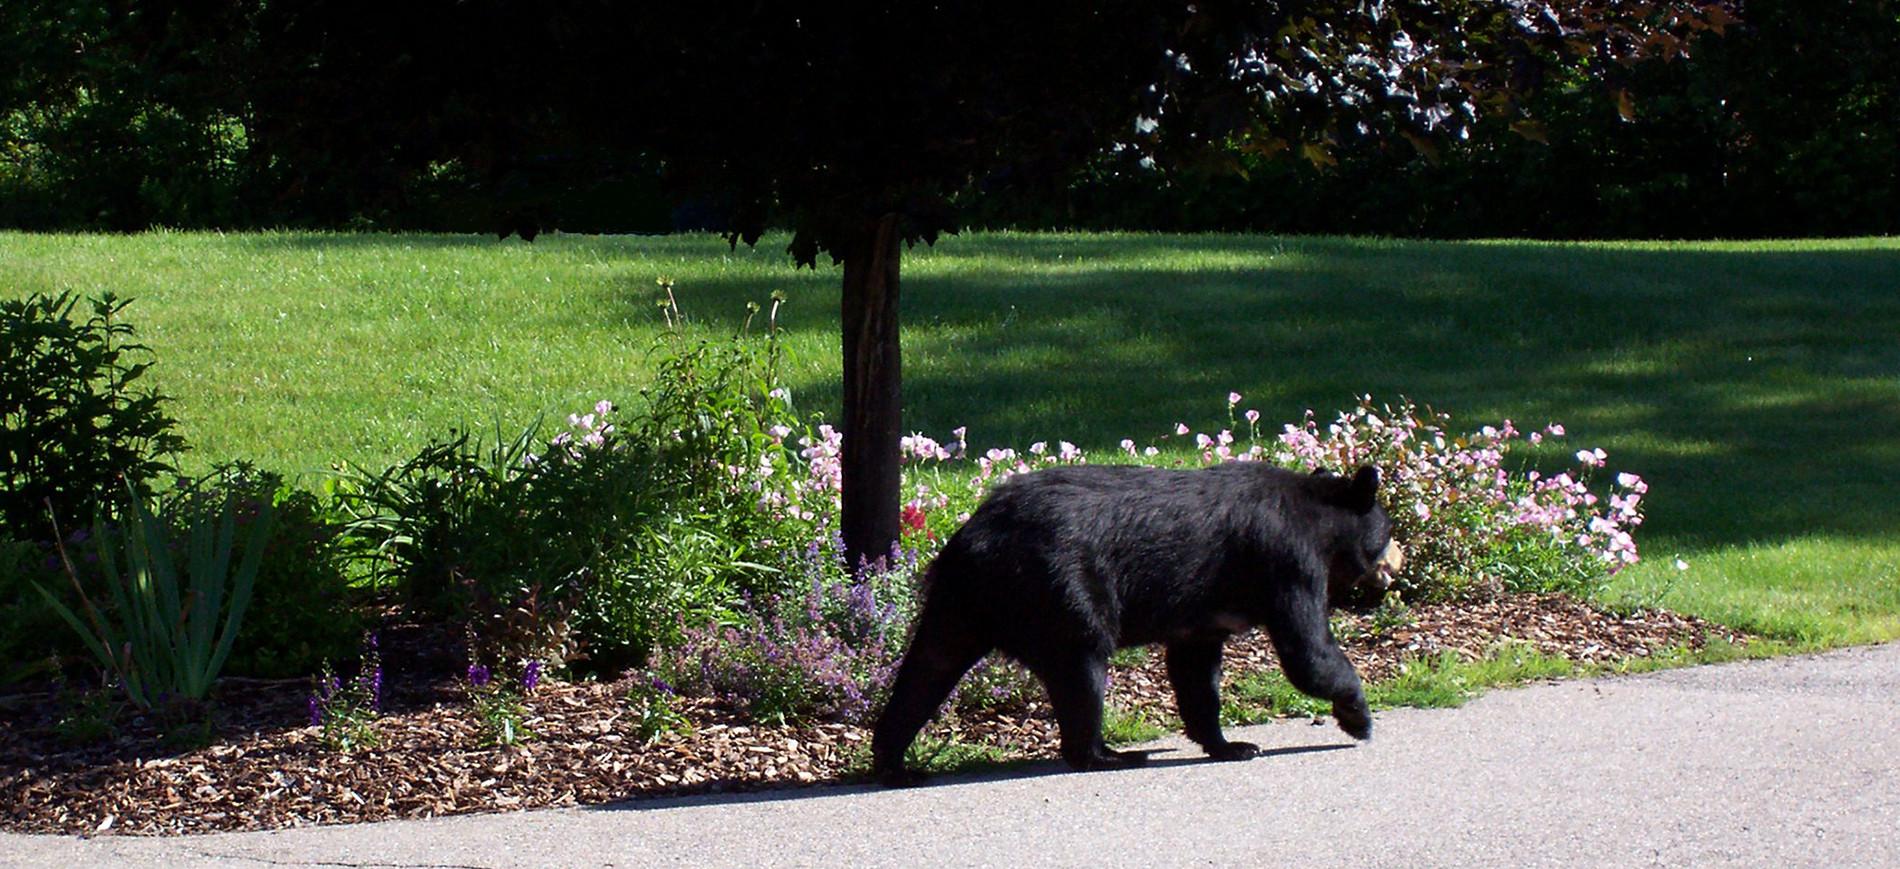 Black bear walking on driveway with flower garden behind